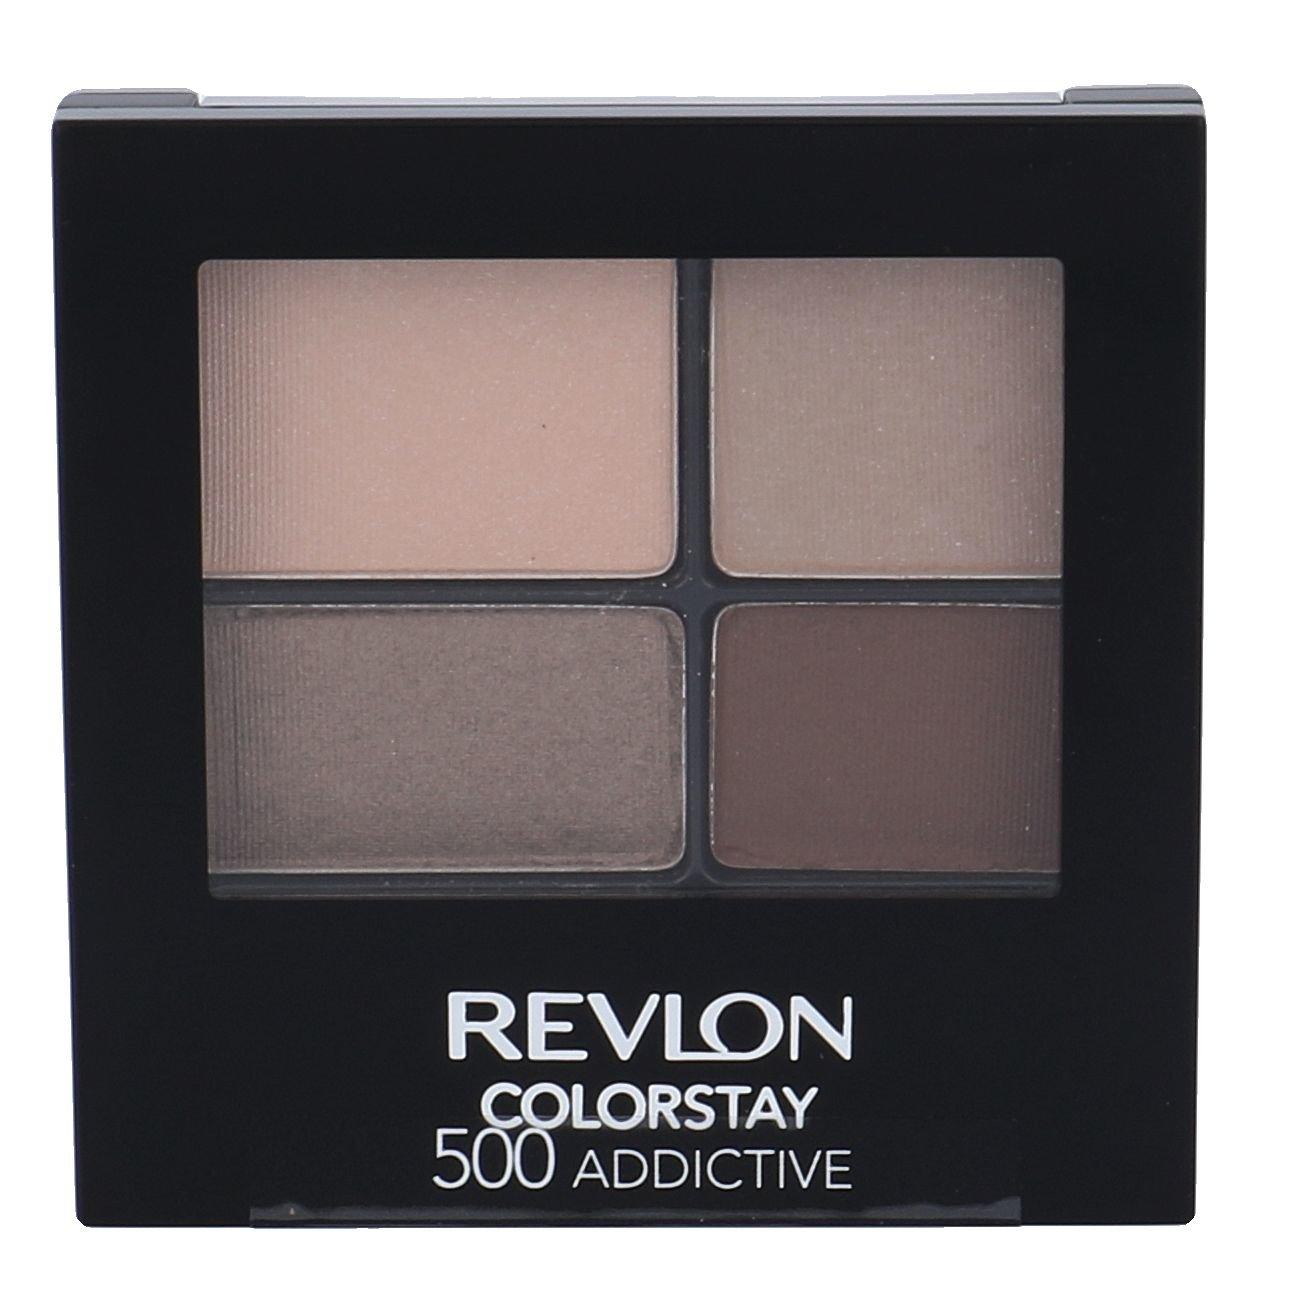 Revlon Colorstay Cosmetic 4,8ml 500 Addictive